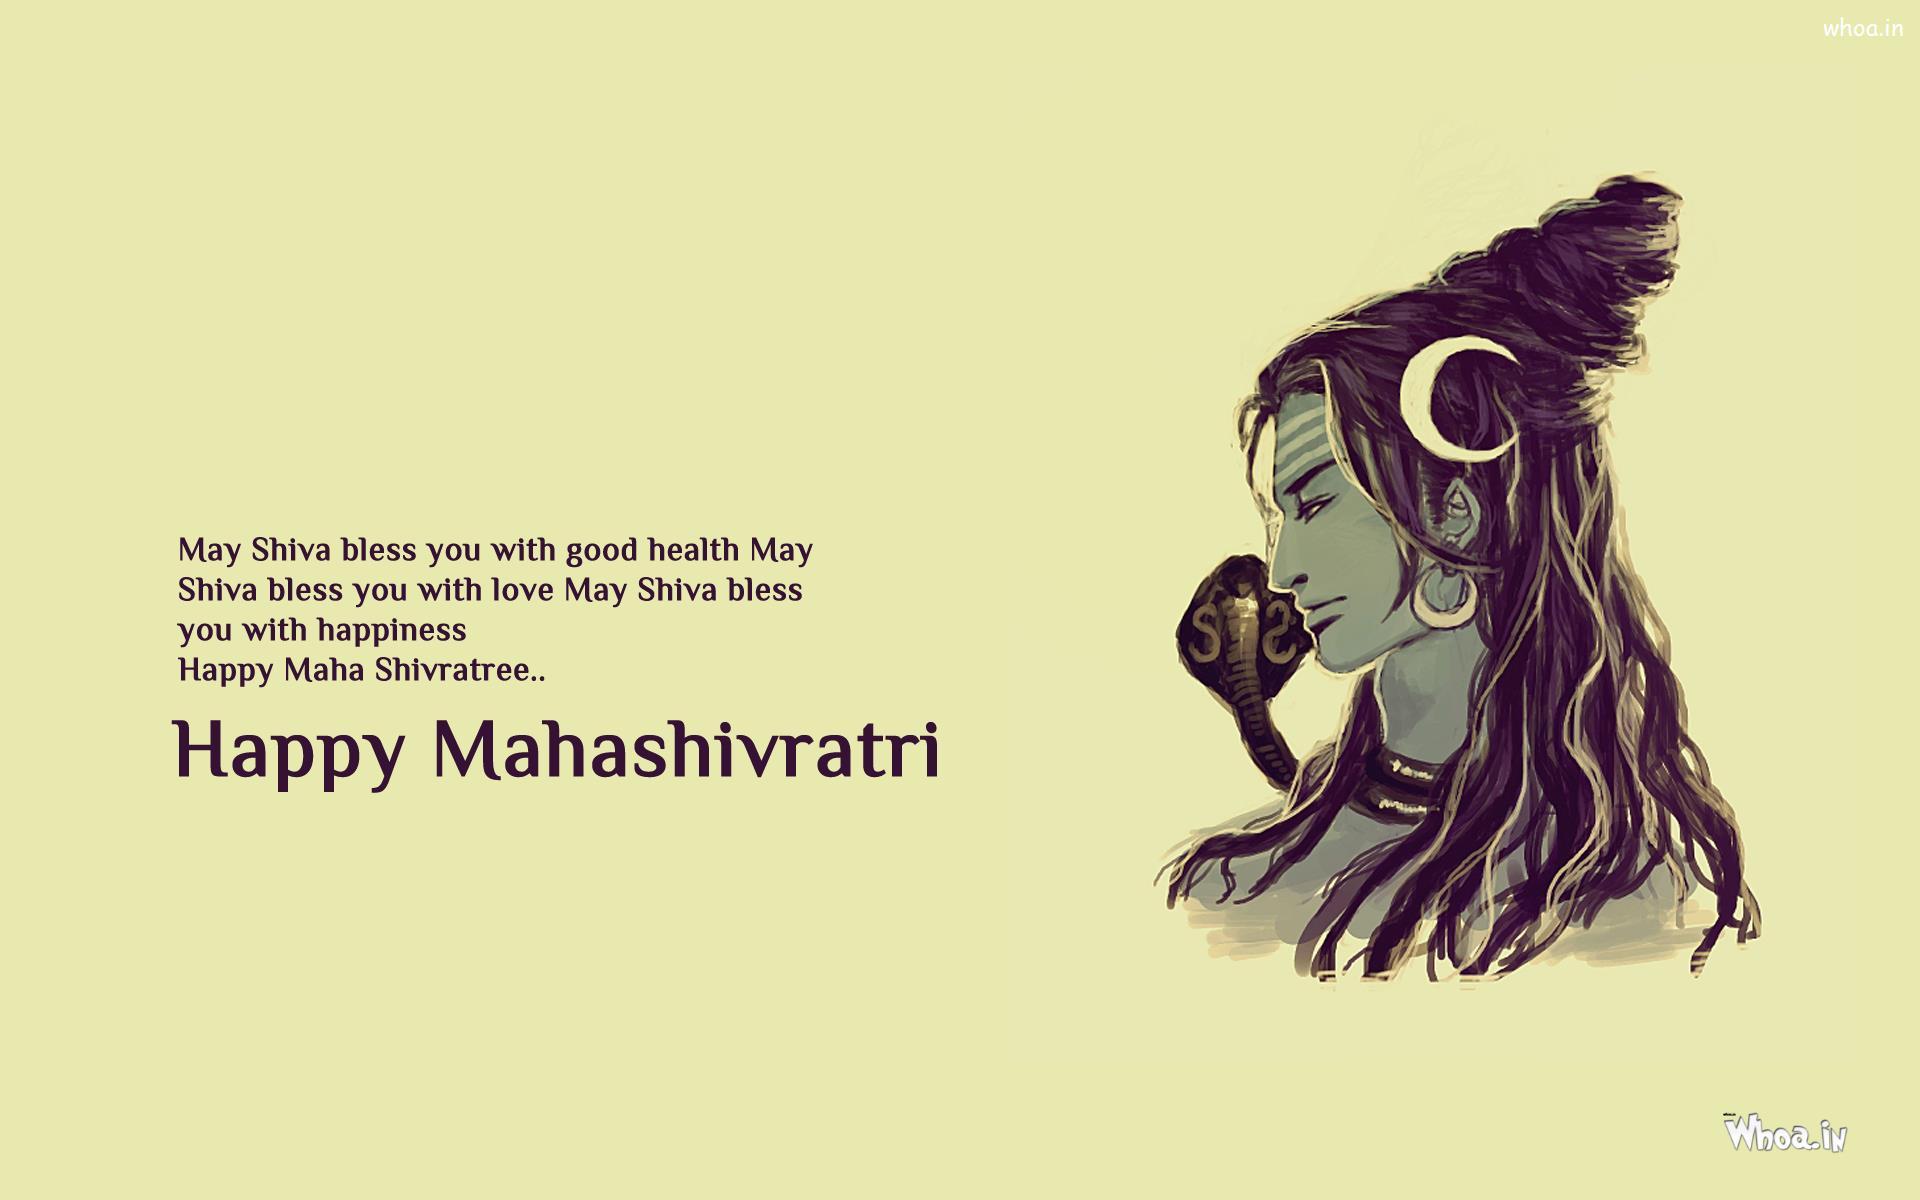 Lord Shiva Mahashivratri Quotes - HD Wallpaper